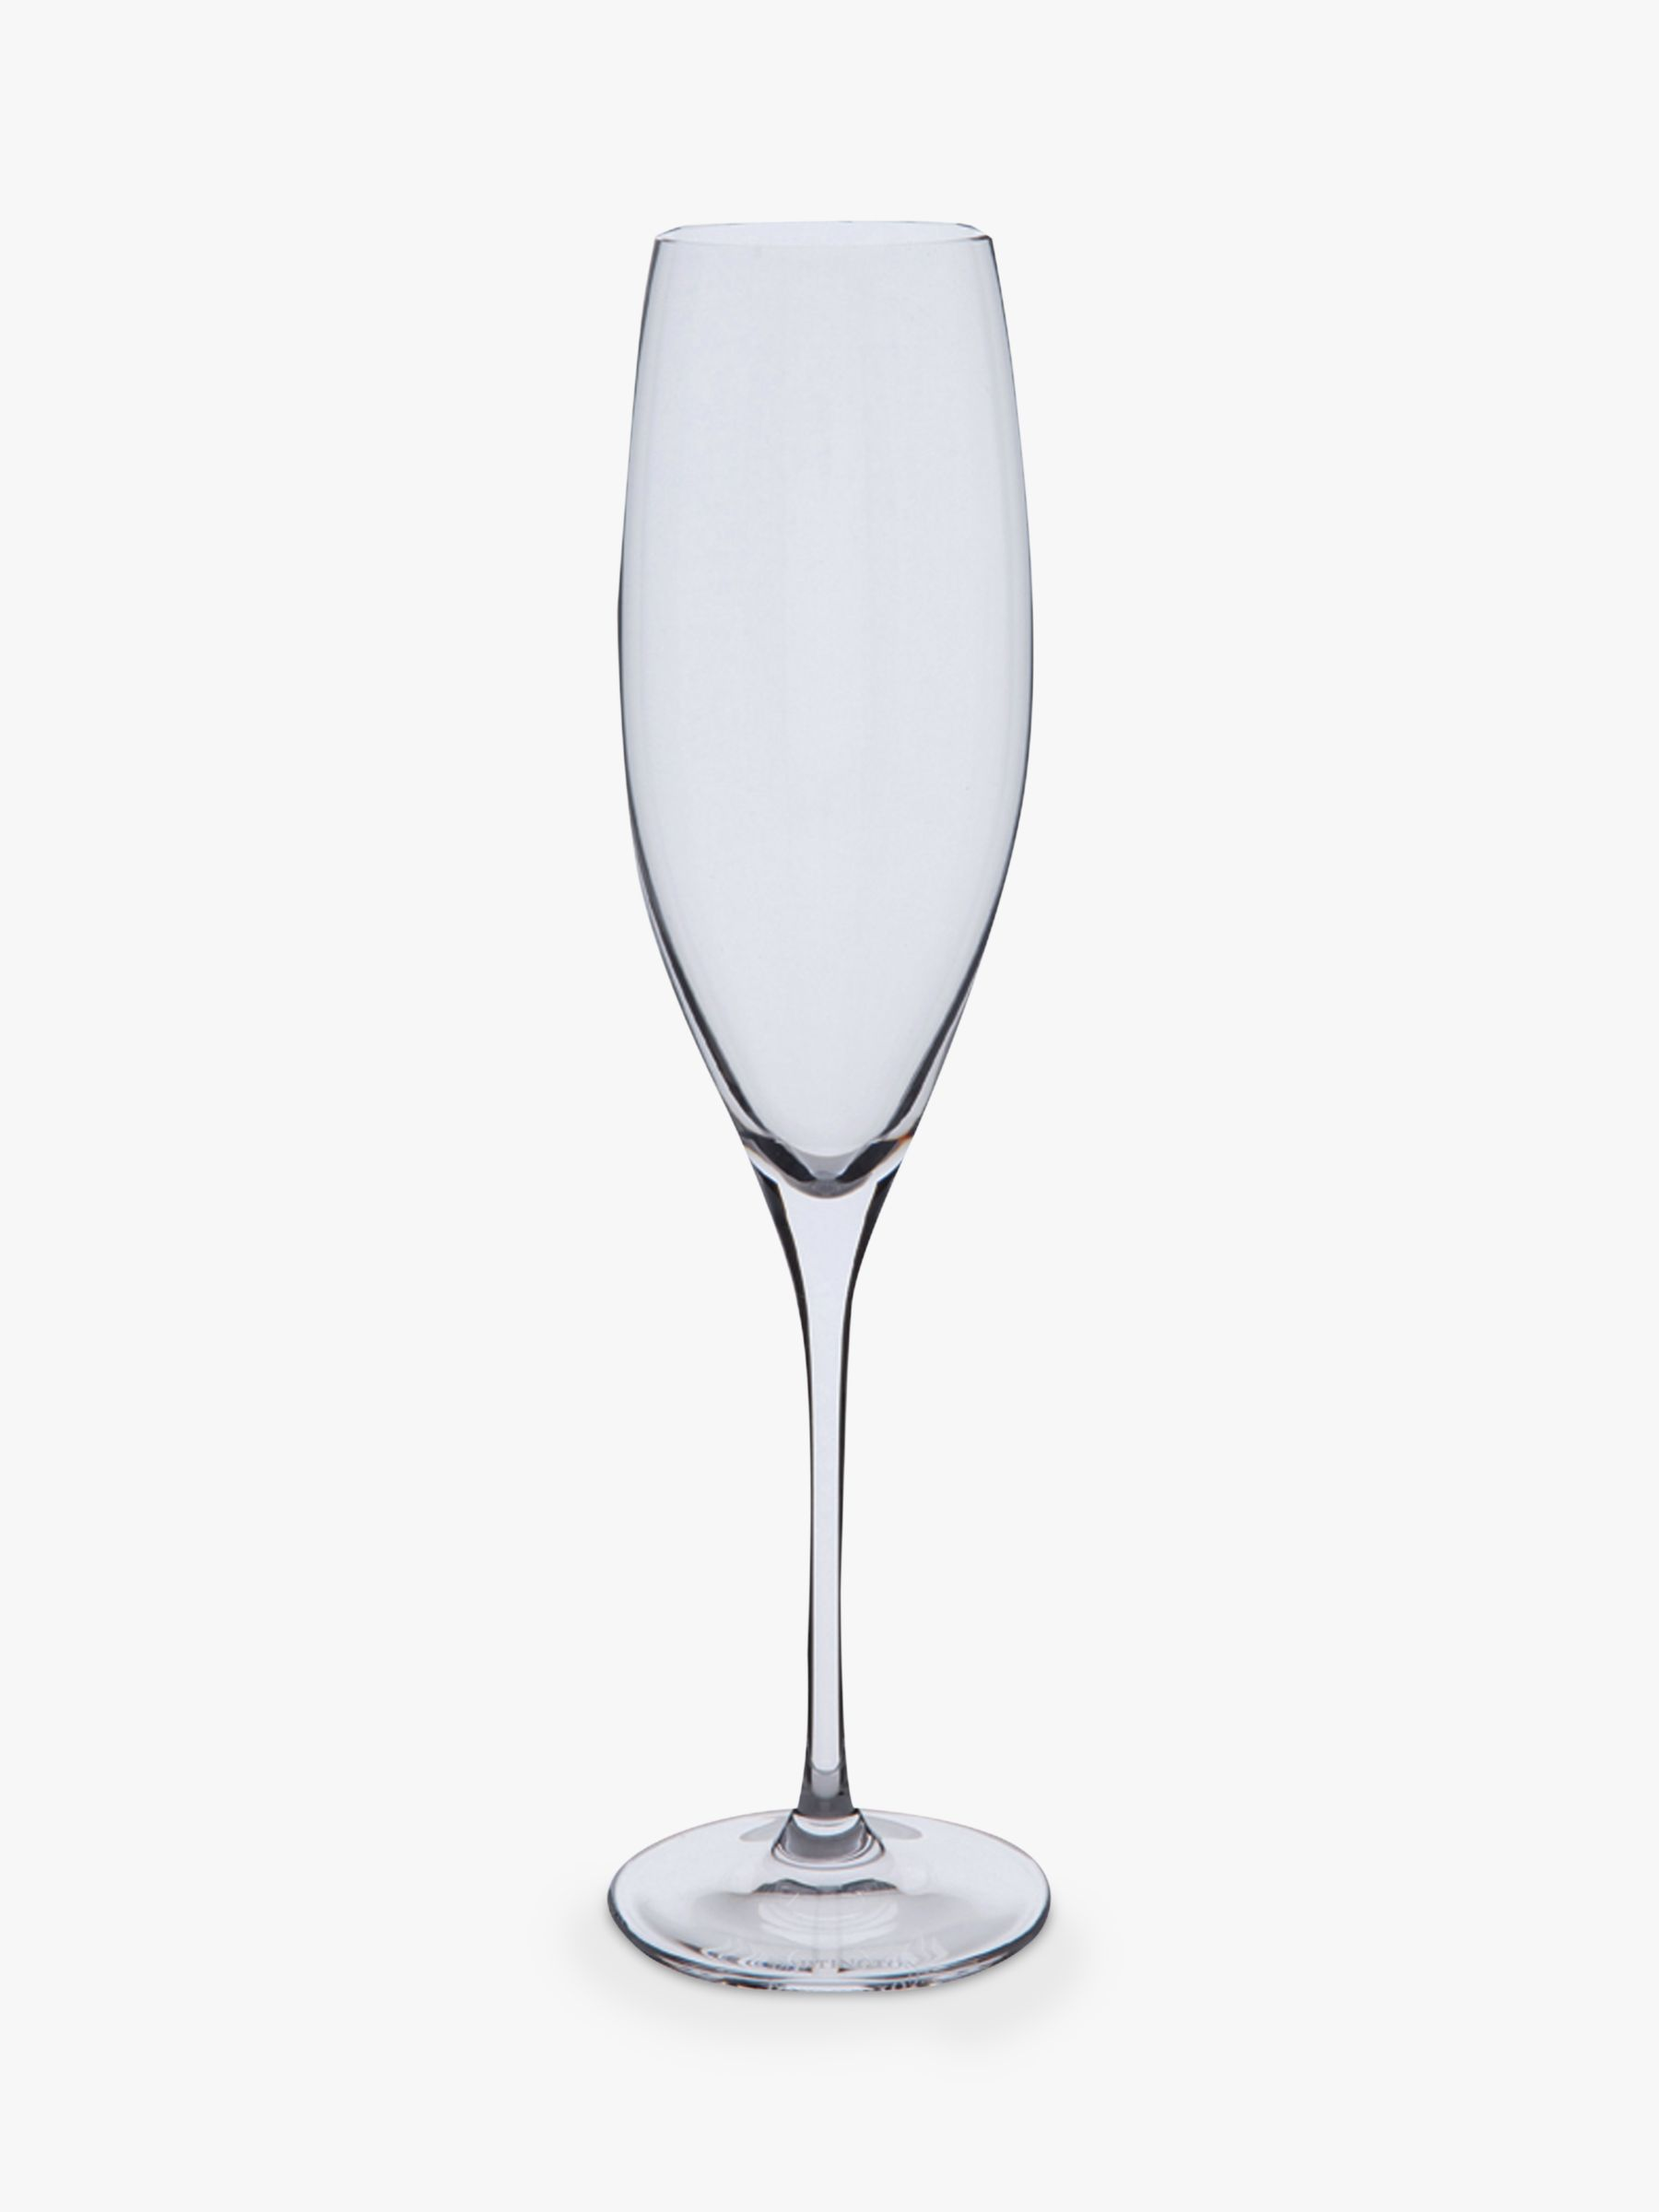 Dartington Crystal Dartington Crystal Personalised Wine Master Flute (Single), Palace Script Font